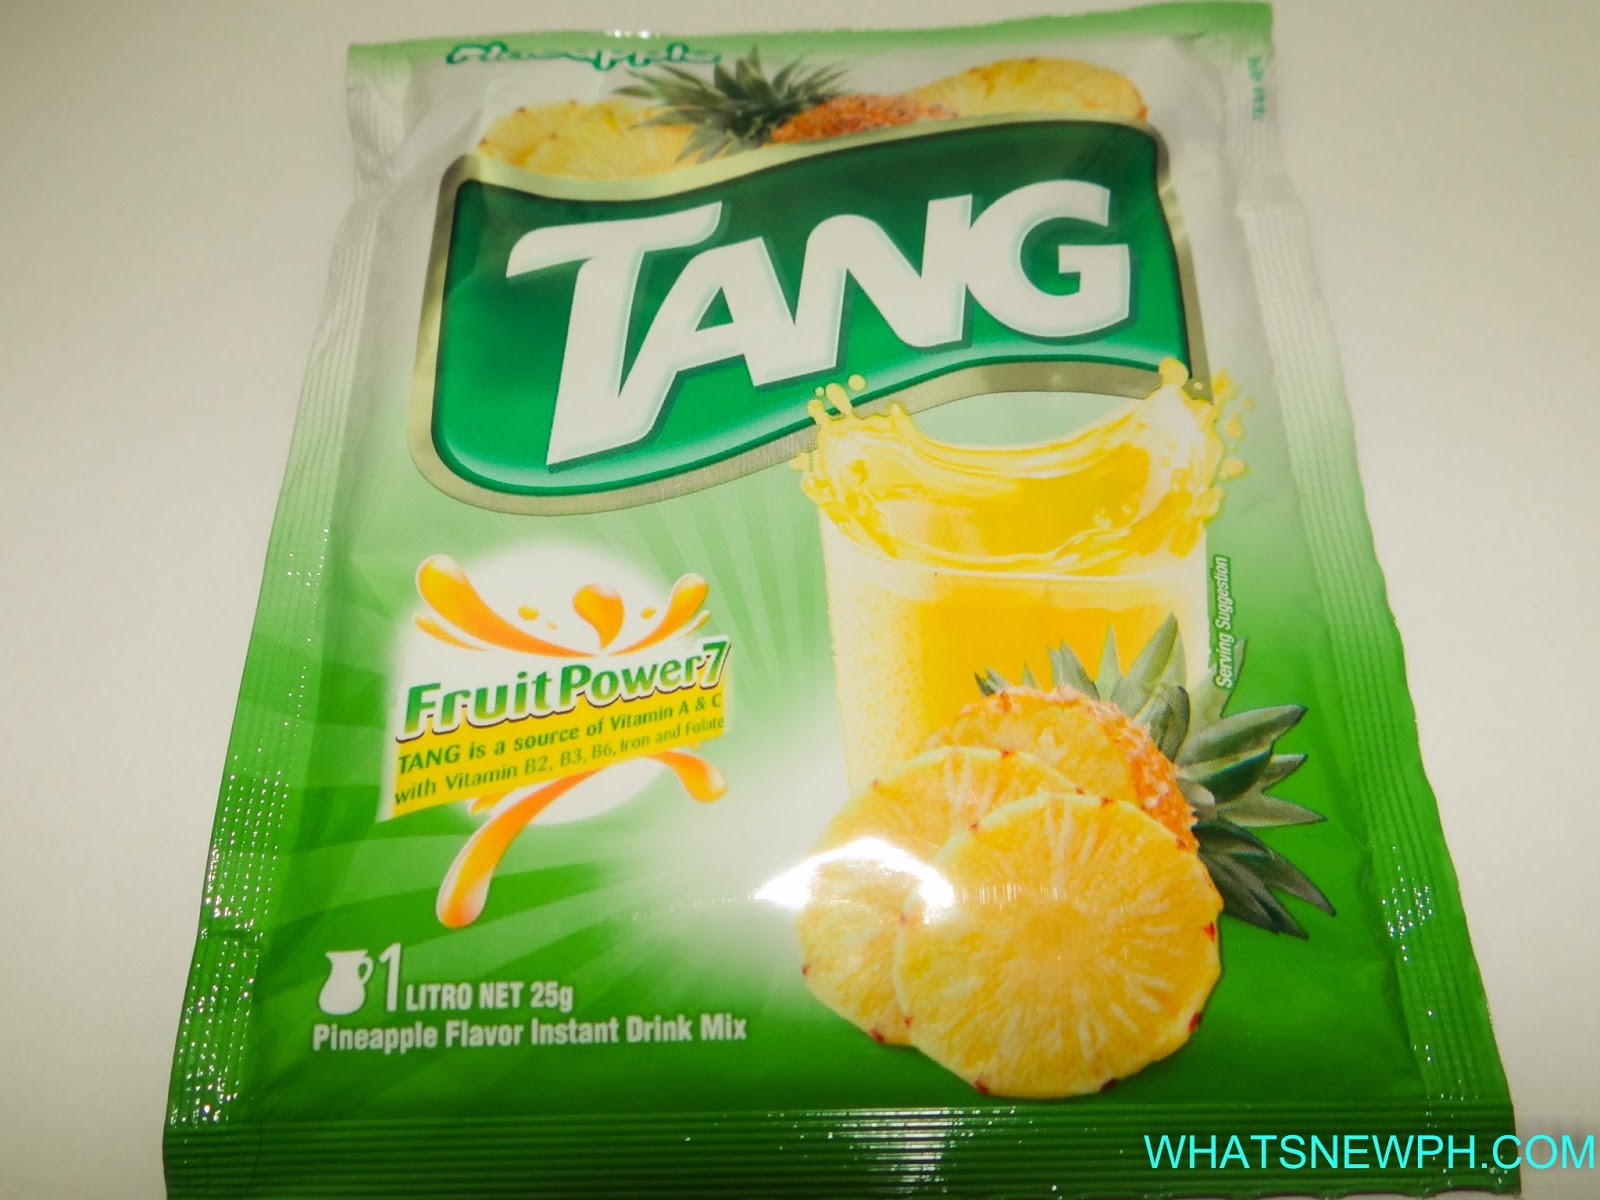 market study marketing 310 kraft tang instant drink mix